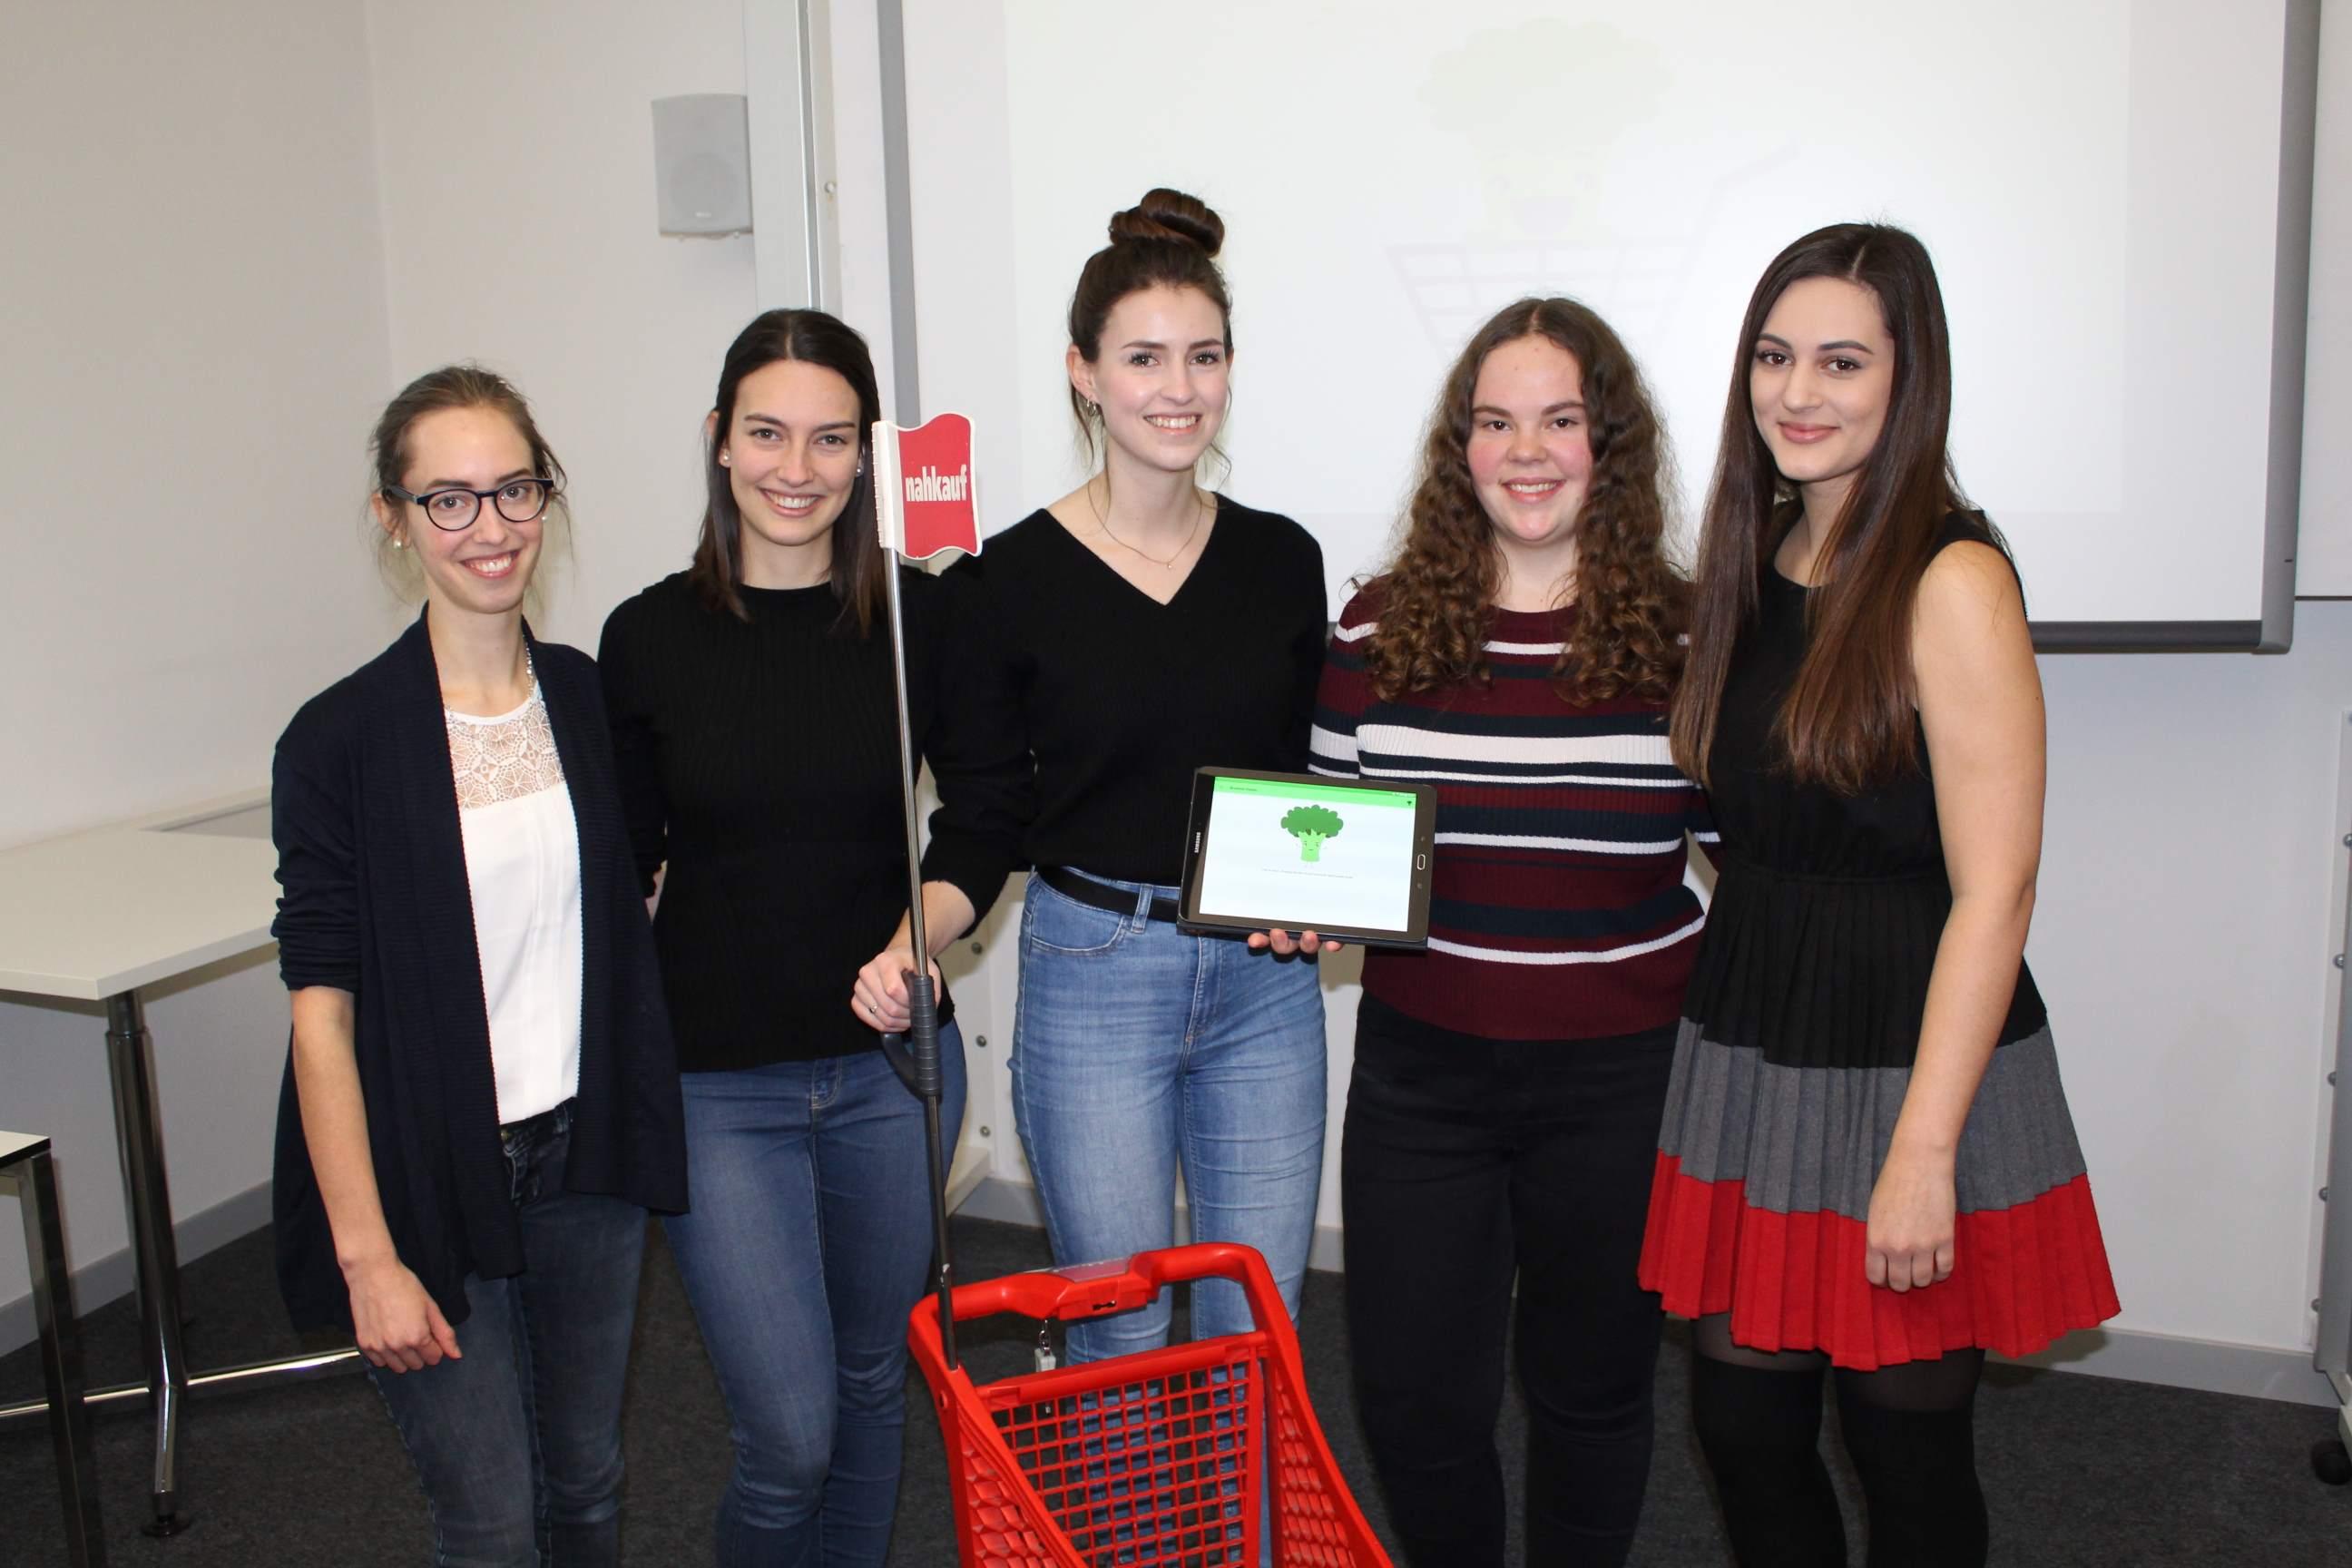 Sophia, Anja, Therese, Selina und Elise hatten immer viel Freude beim Programmieren